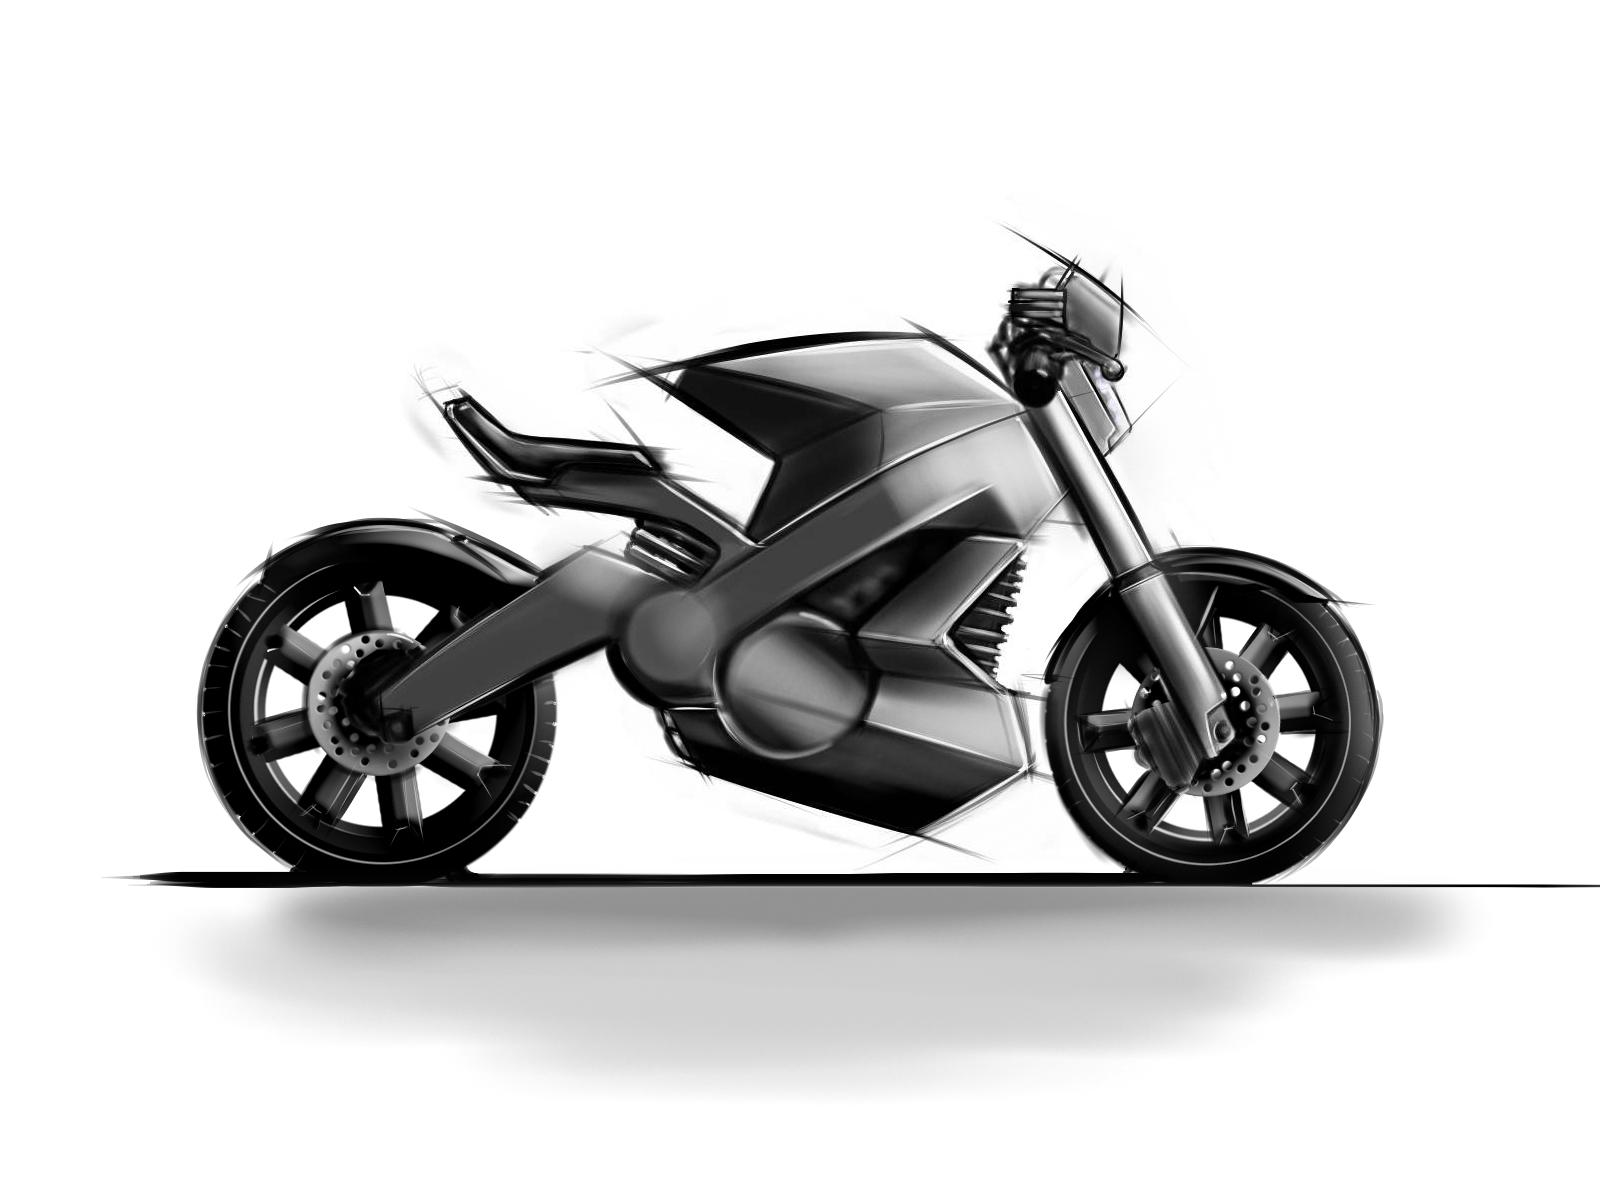 Drawn bike sport bike Bike sketch EV Search bike